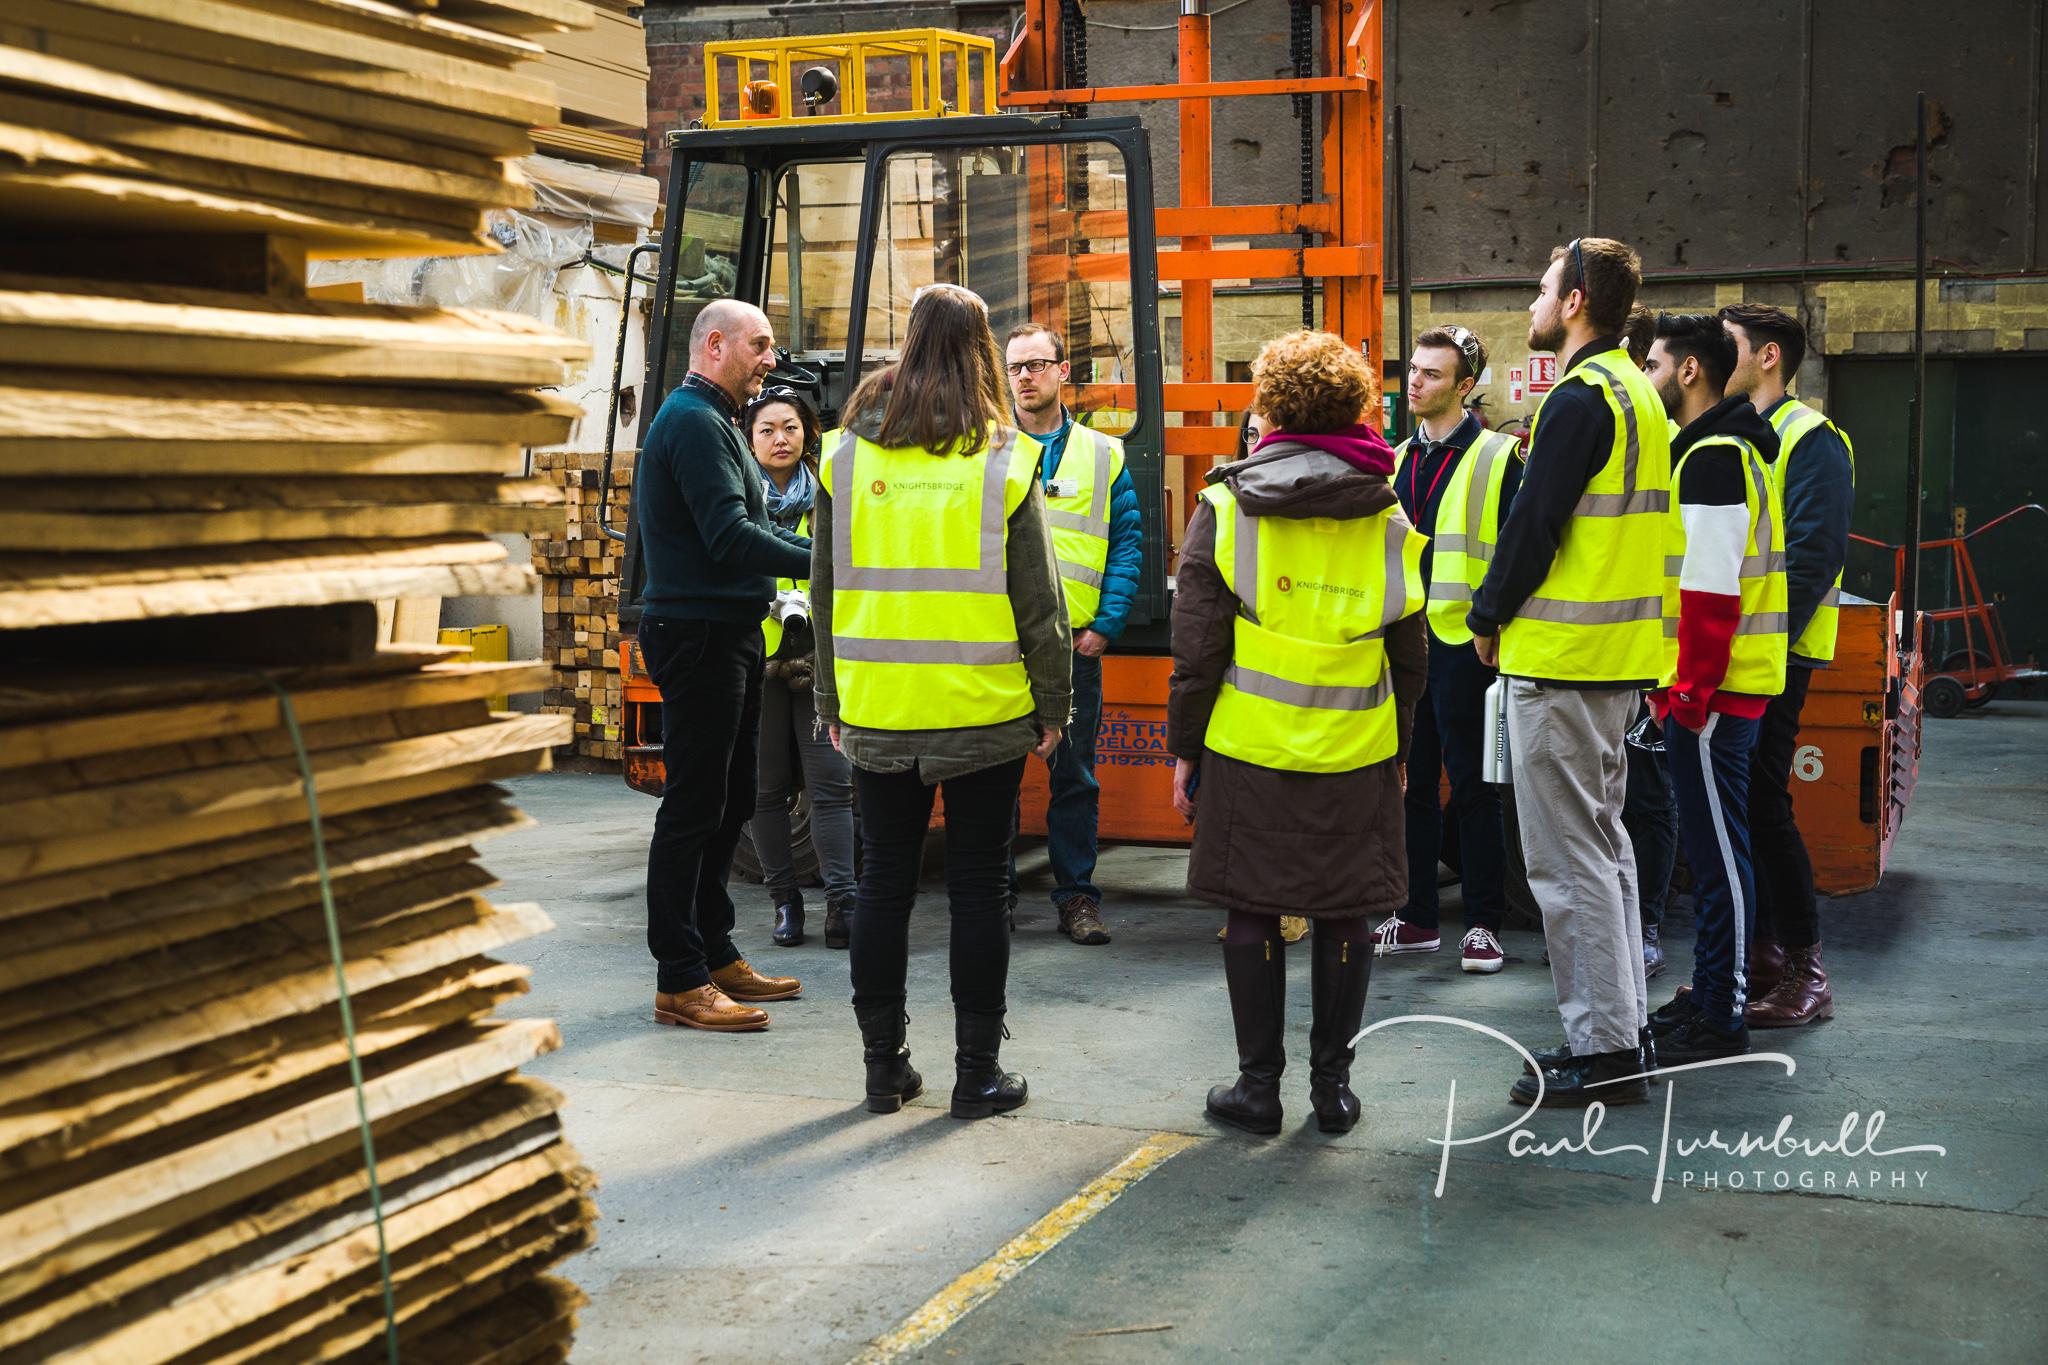 commercial-photographer-leeds-bradford-knightsbridge-furniture-tour-005.jpg